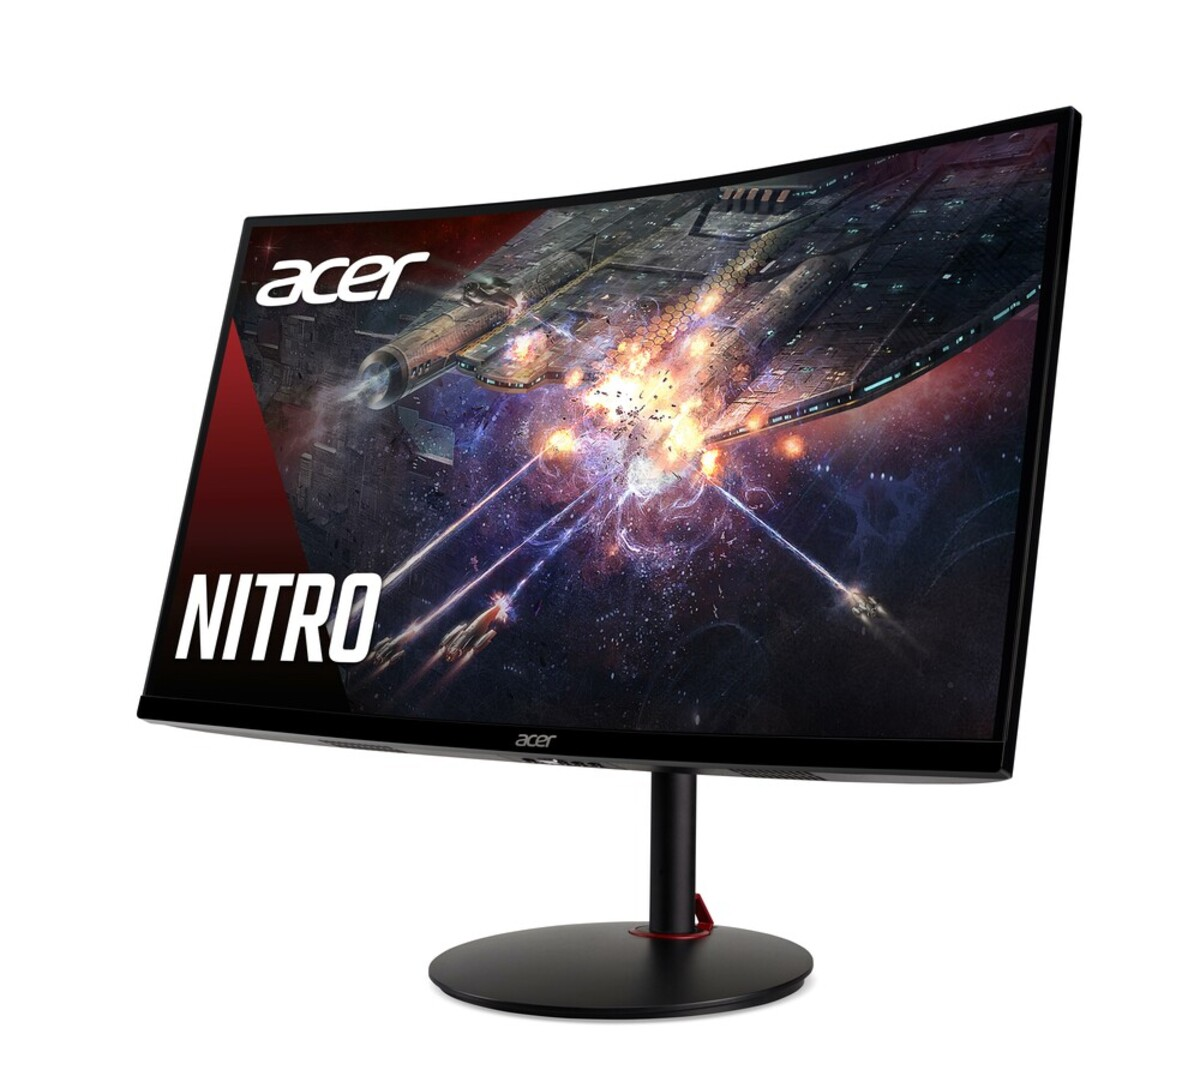 Bild 3 von ACER Nitro XZ270UPbmiiphx Gaming-Monitor (G, 27 Zoll, 2560x1440, VA, 16:9, 1 ms, 2x HDMI, DP, Freesync, 144 Hz, Pivot, Curved, Lautsprecher)